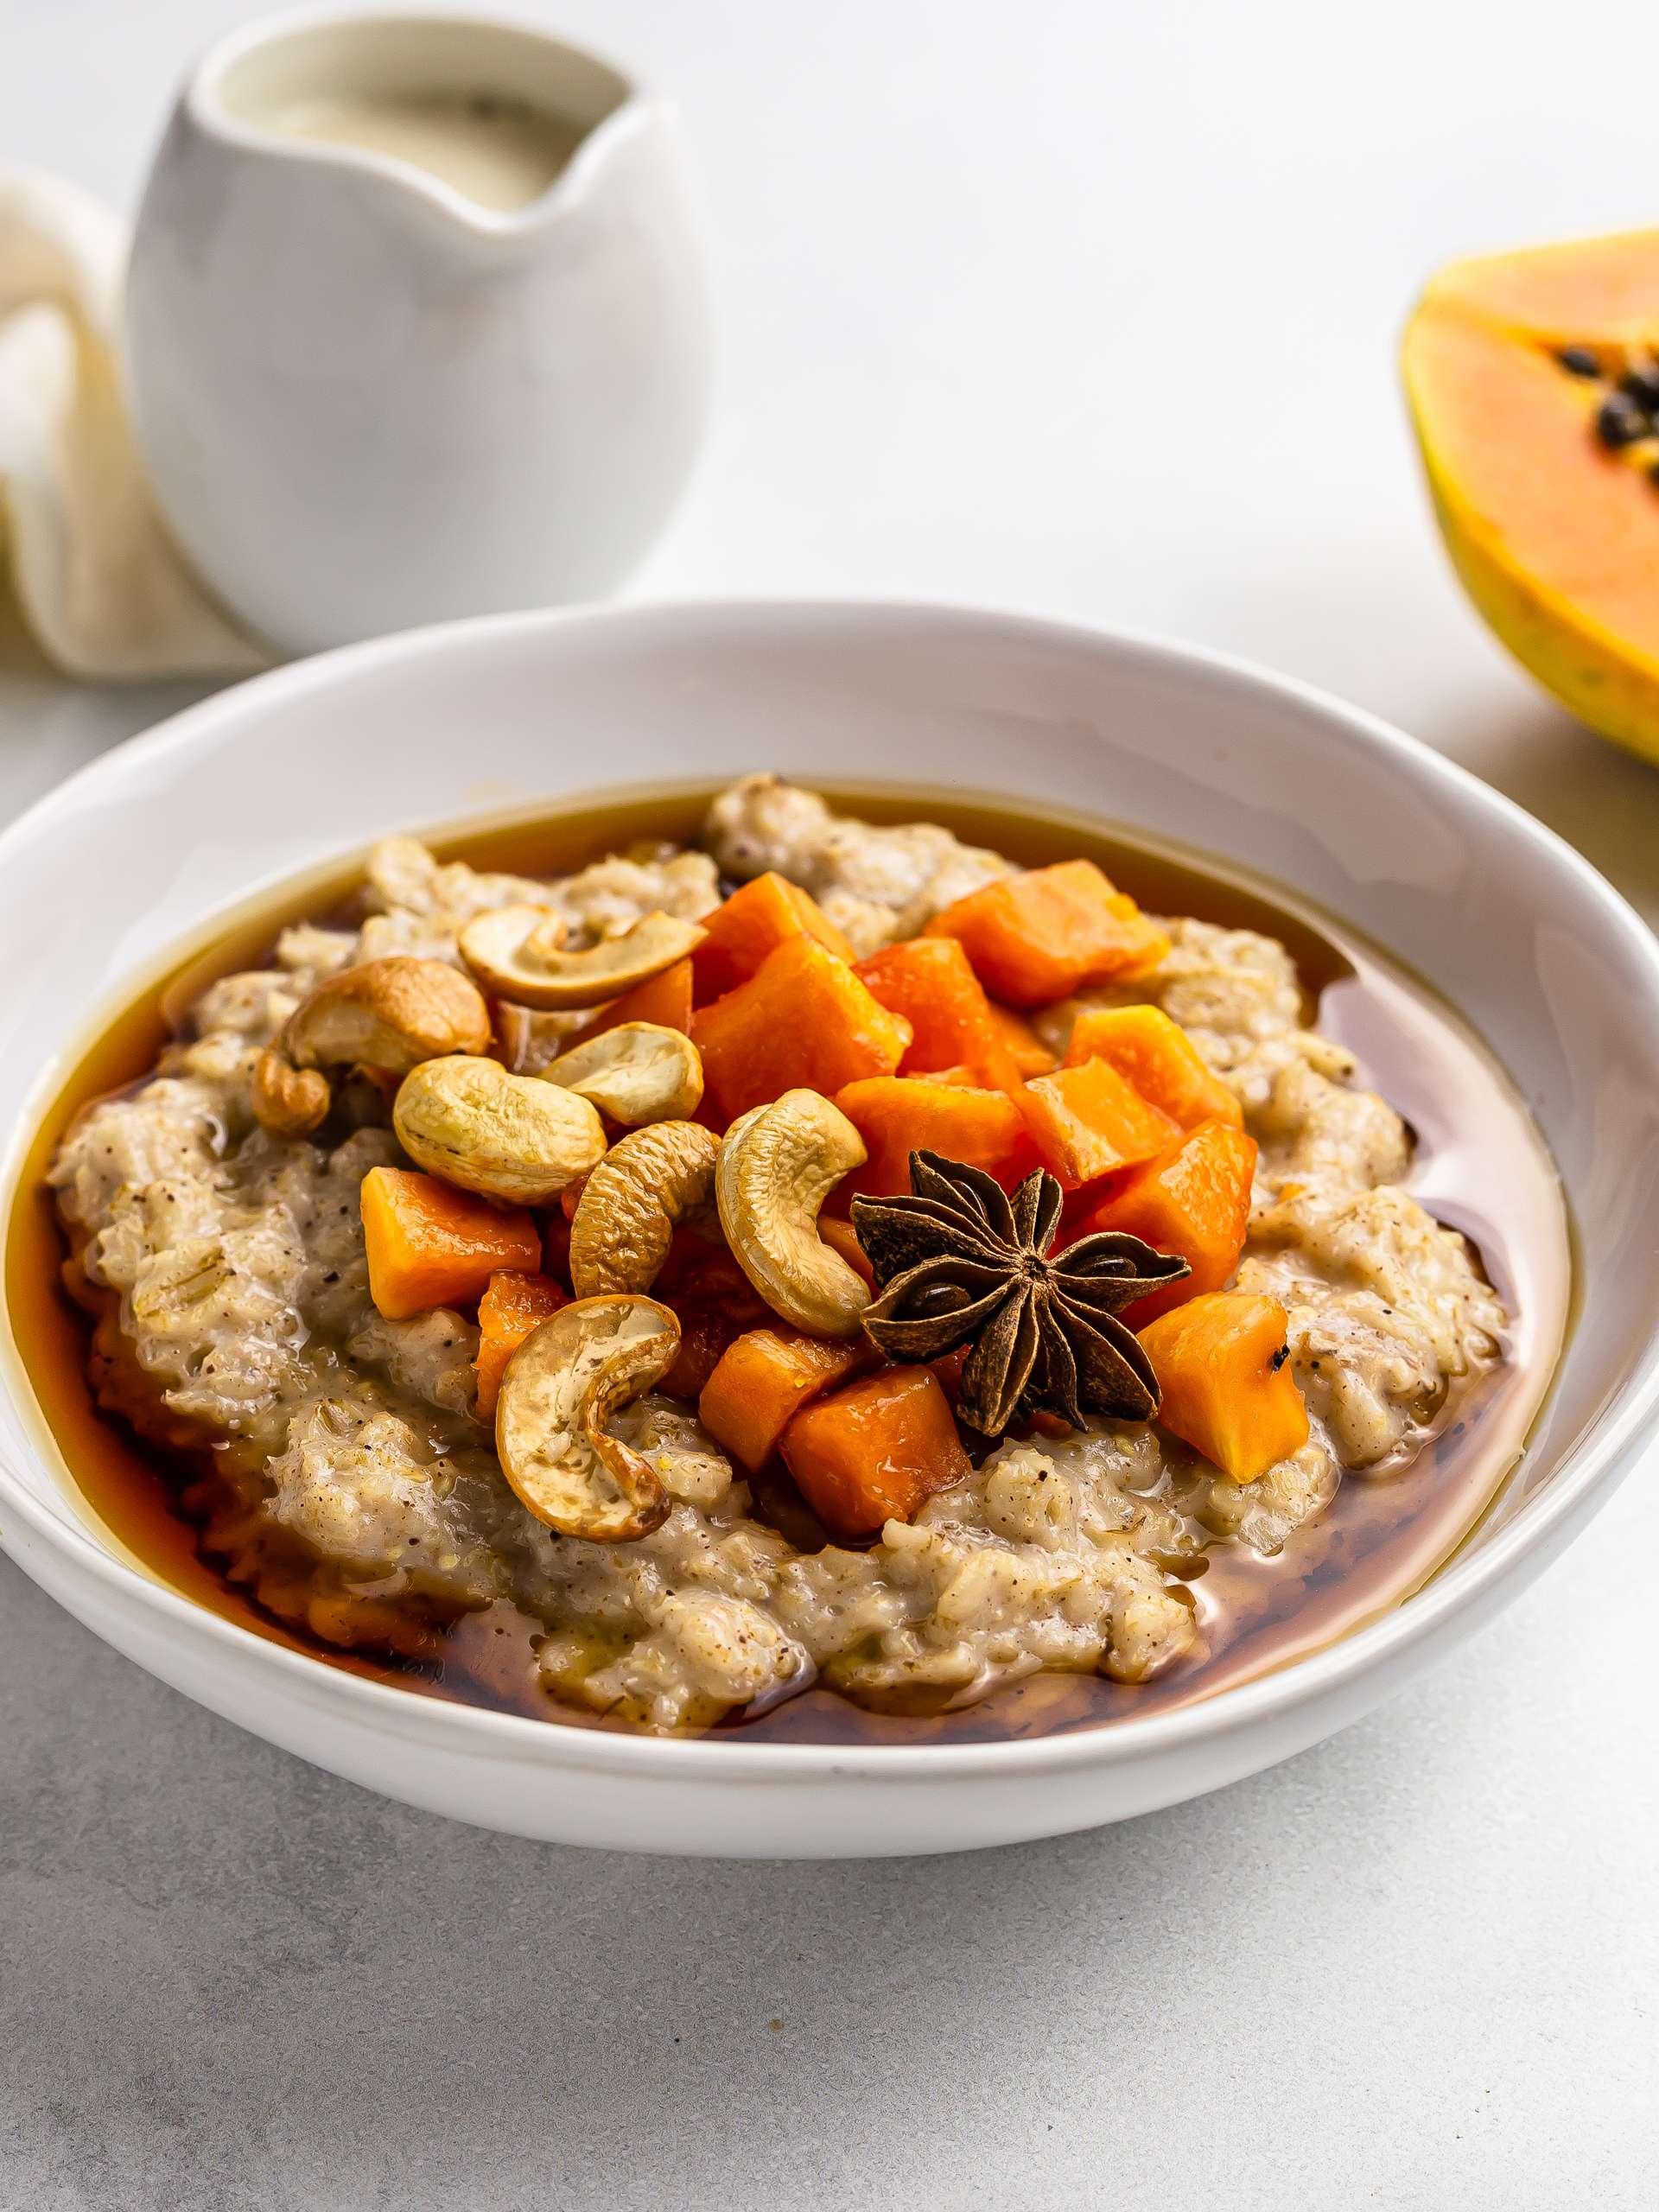 Haitian Oatmeal with Papaya